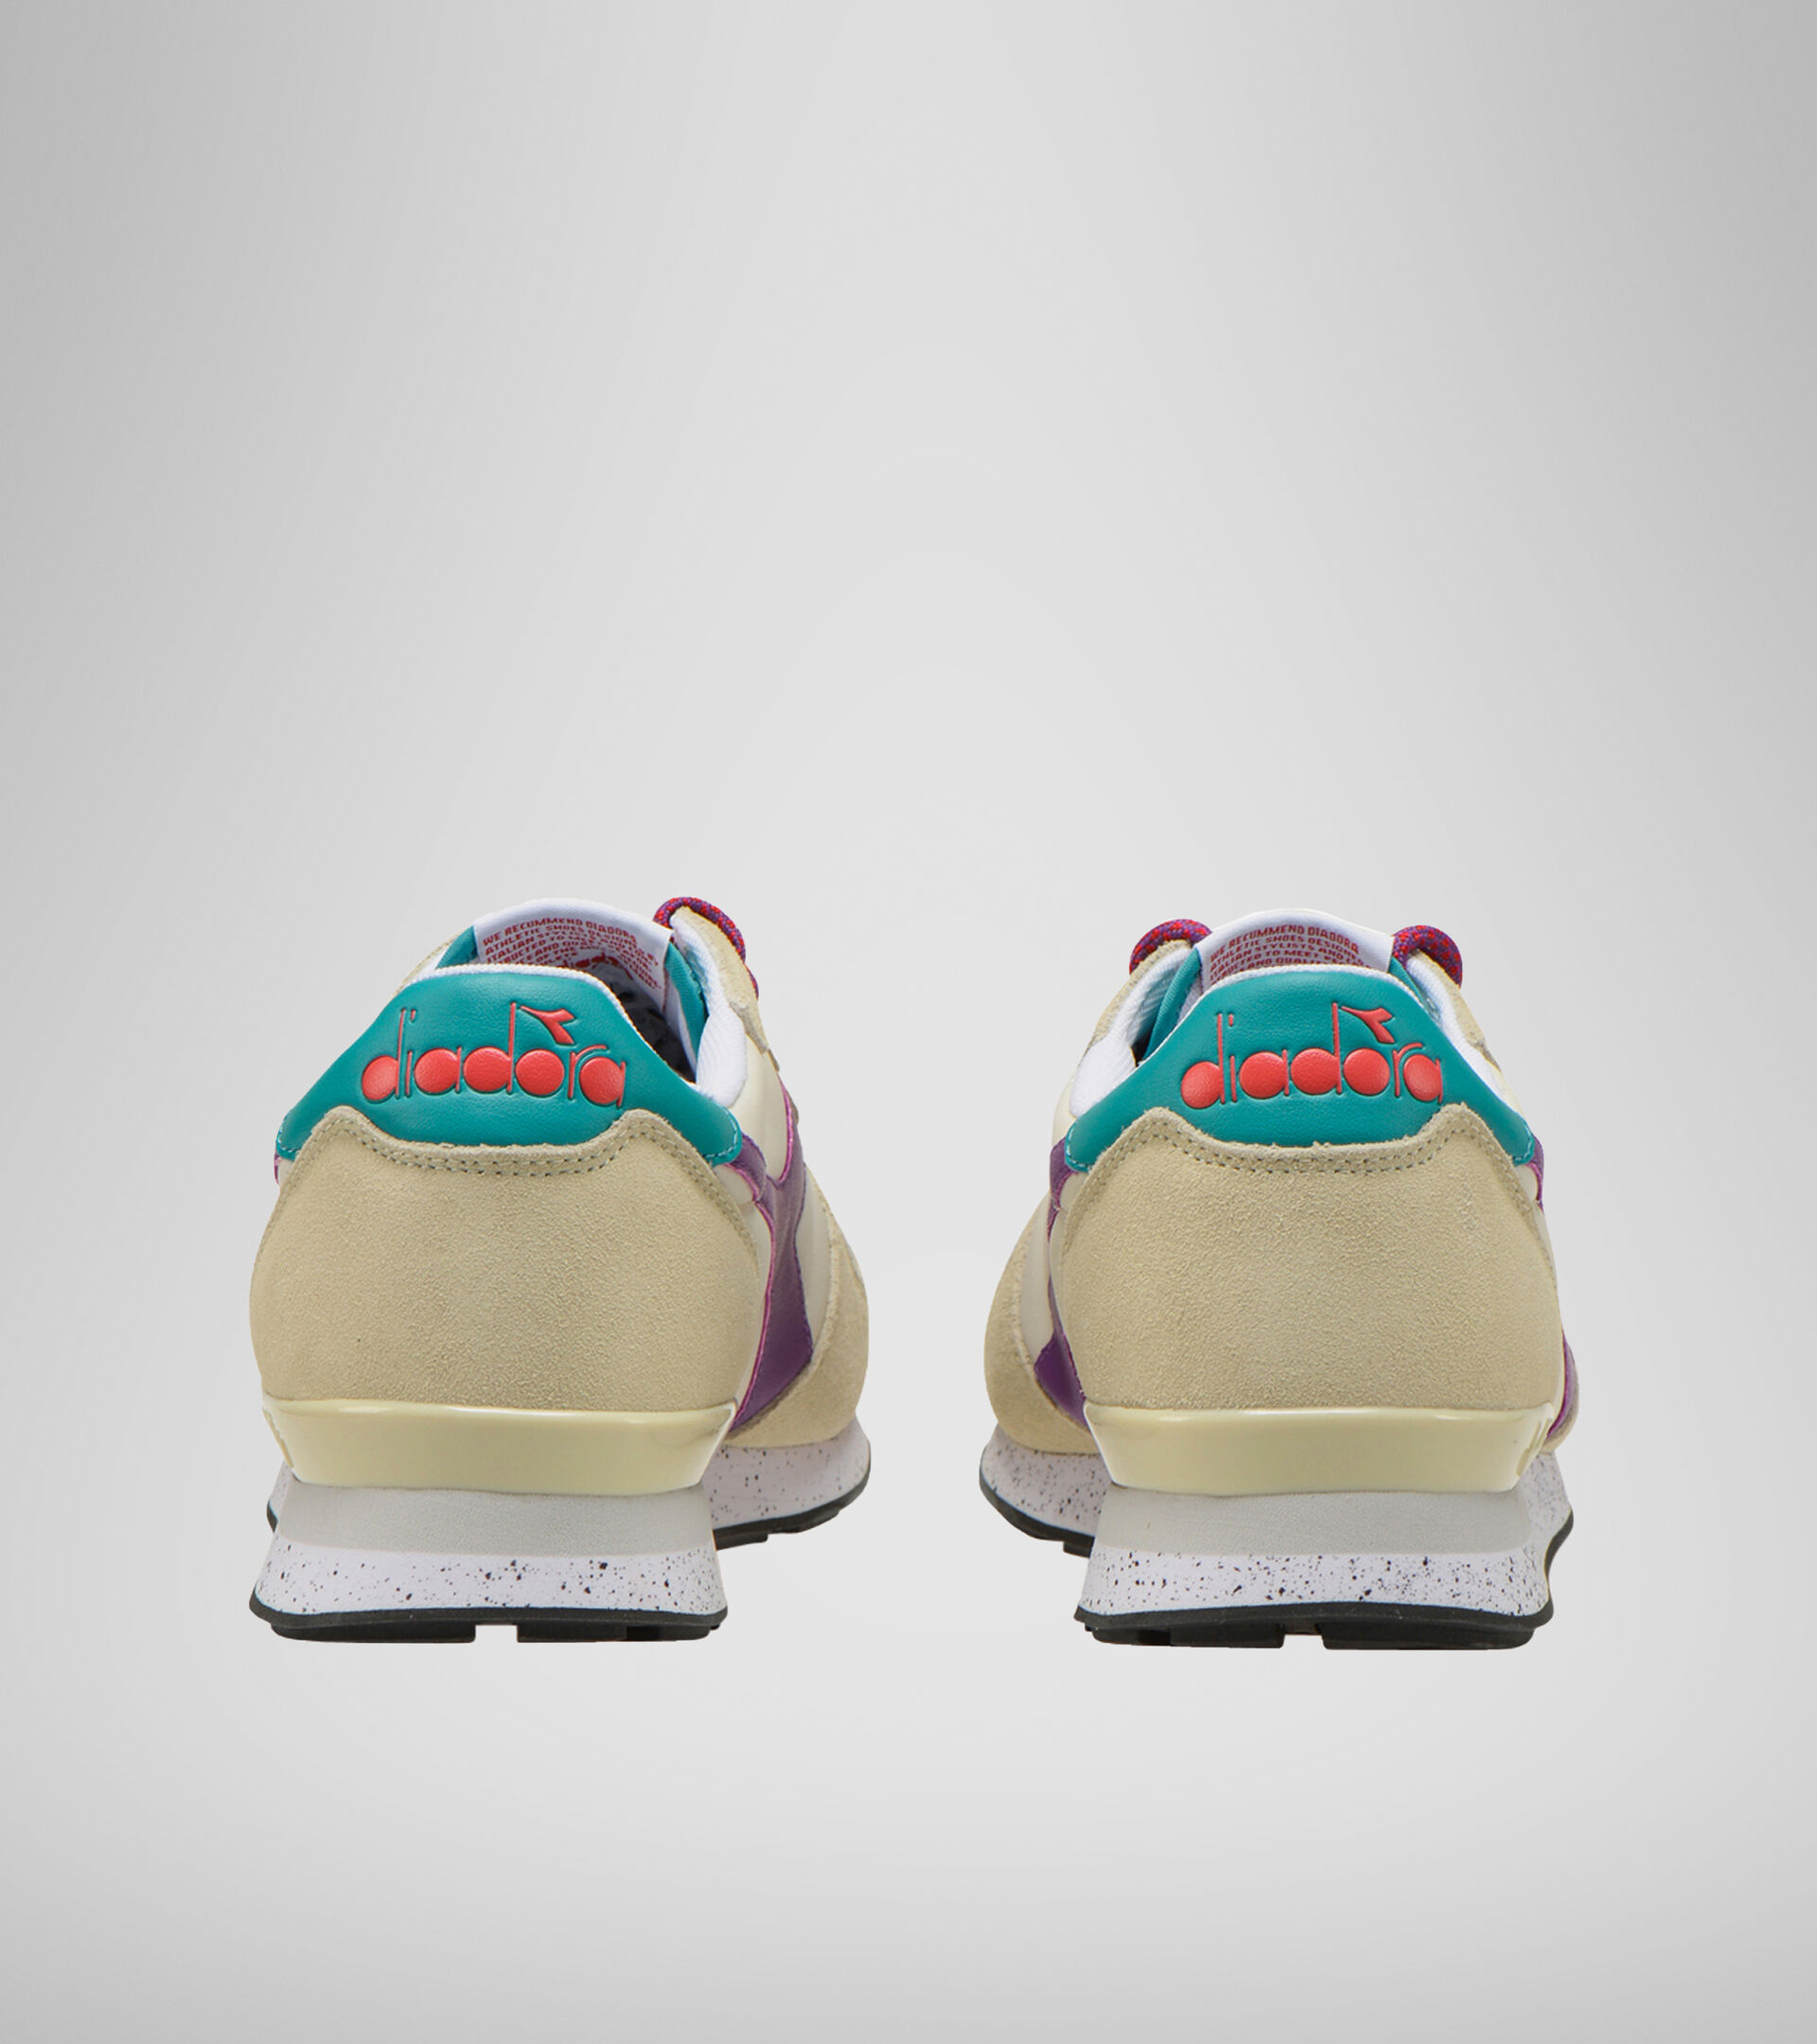 Footwear Sportswear UNISEX CAMARO OUTDOOR BLANCA OSTRA Diadora